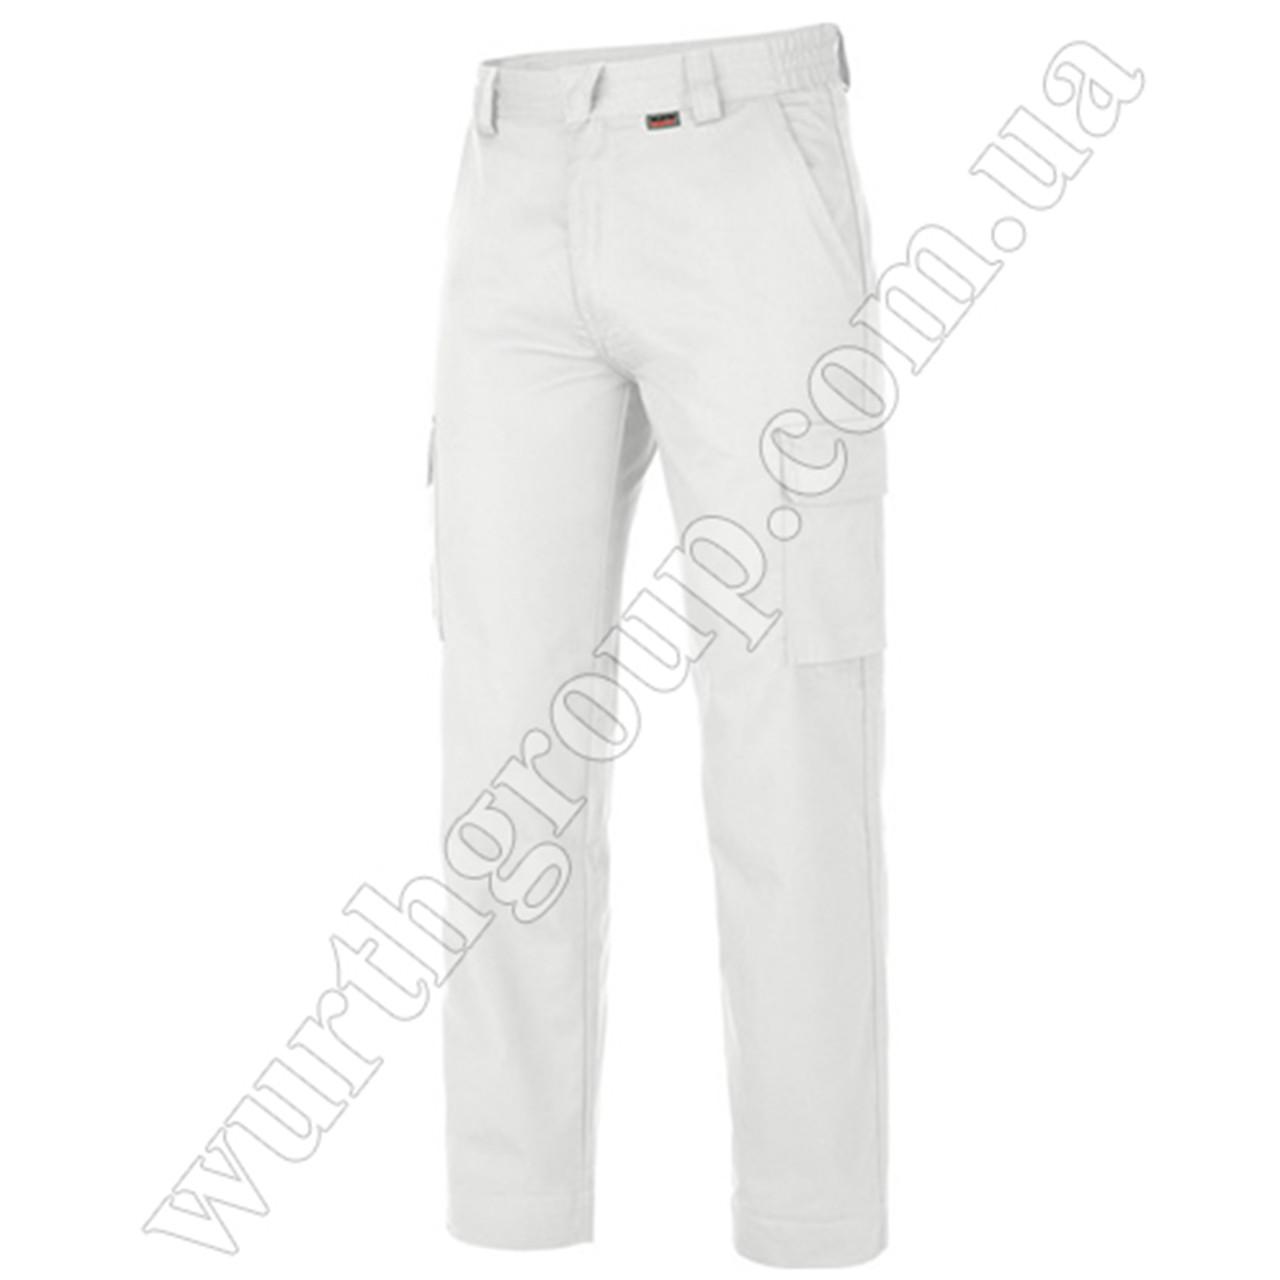 Брюки Modyf Classic Trouser белые Wurth